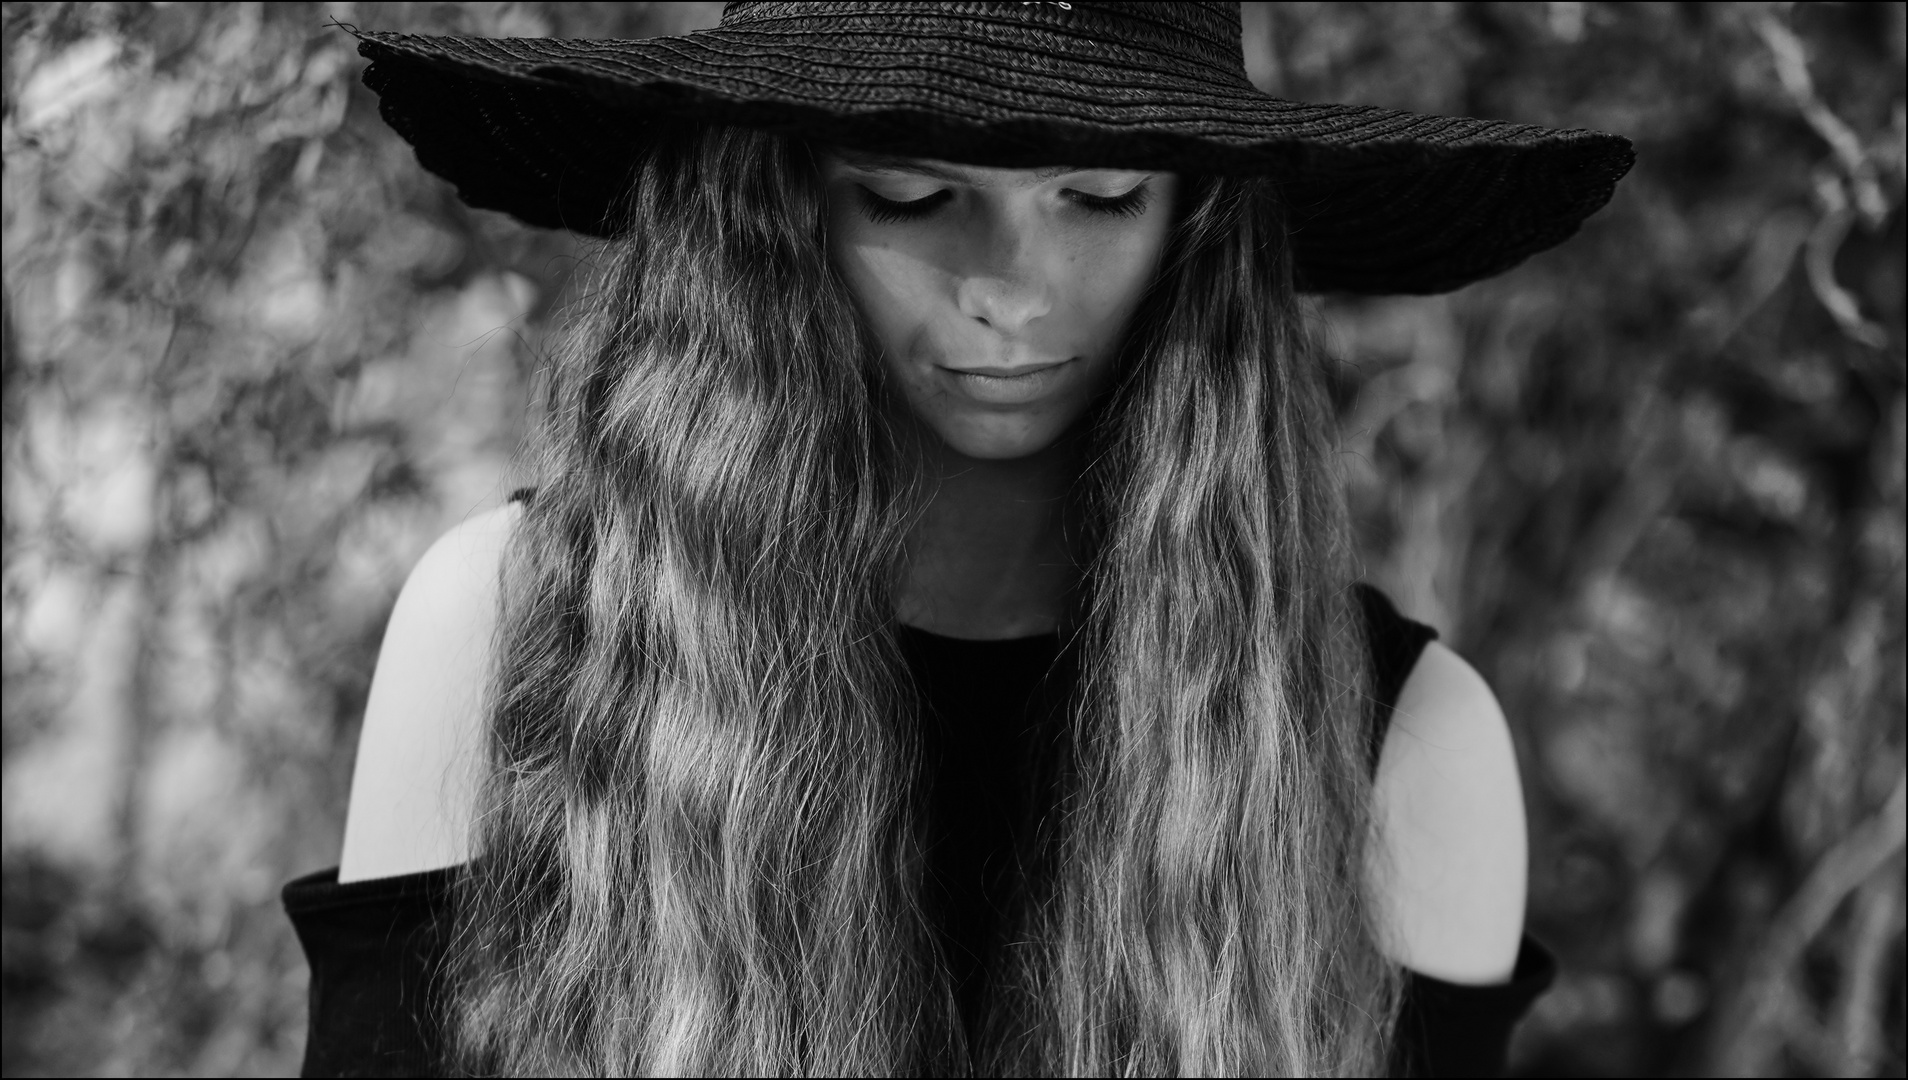 BLACK HAT / WHITE LADY